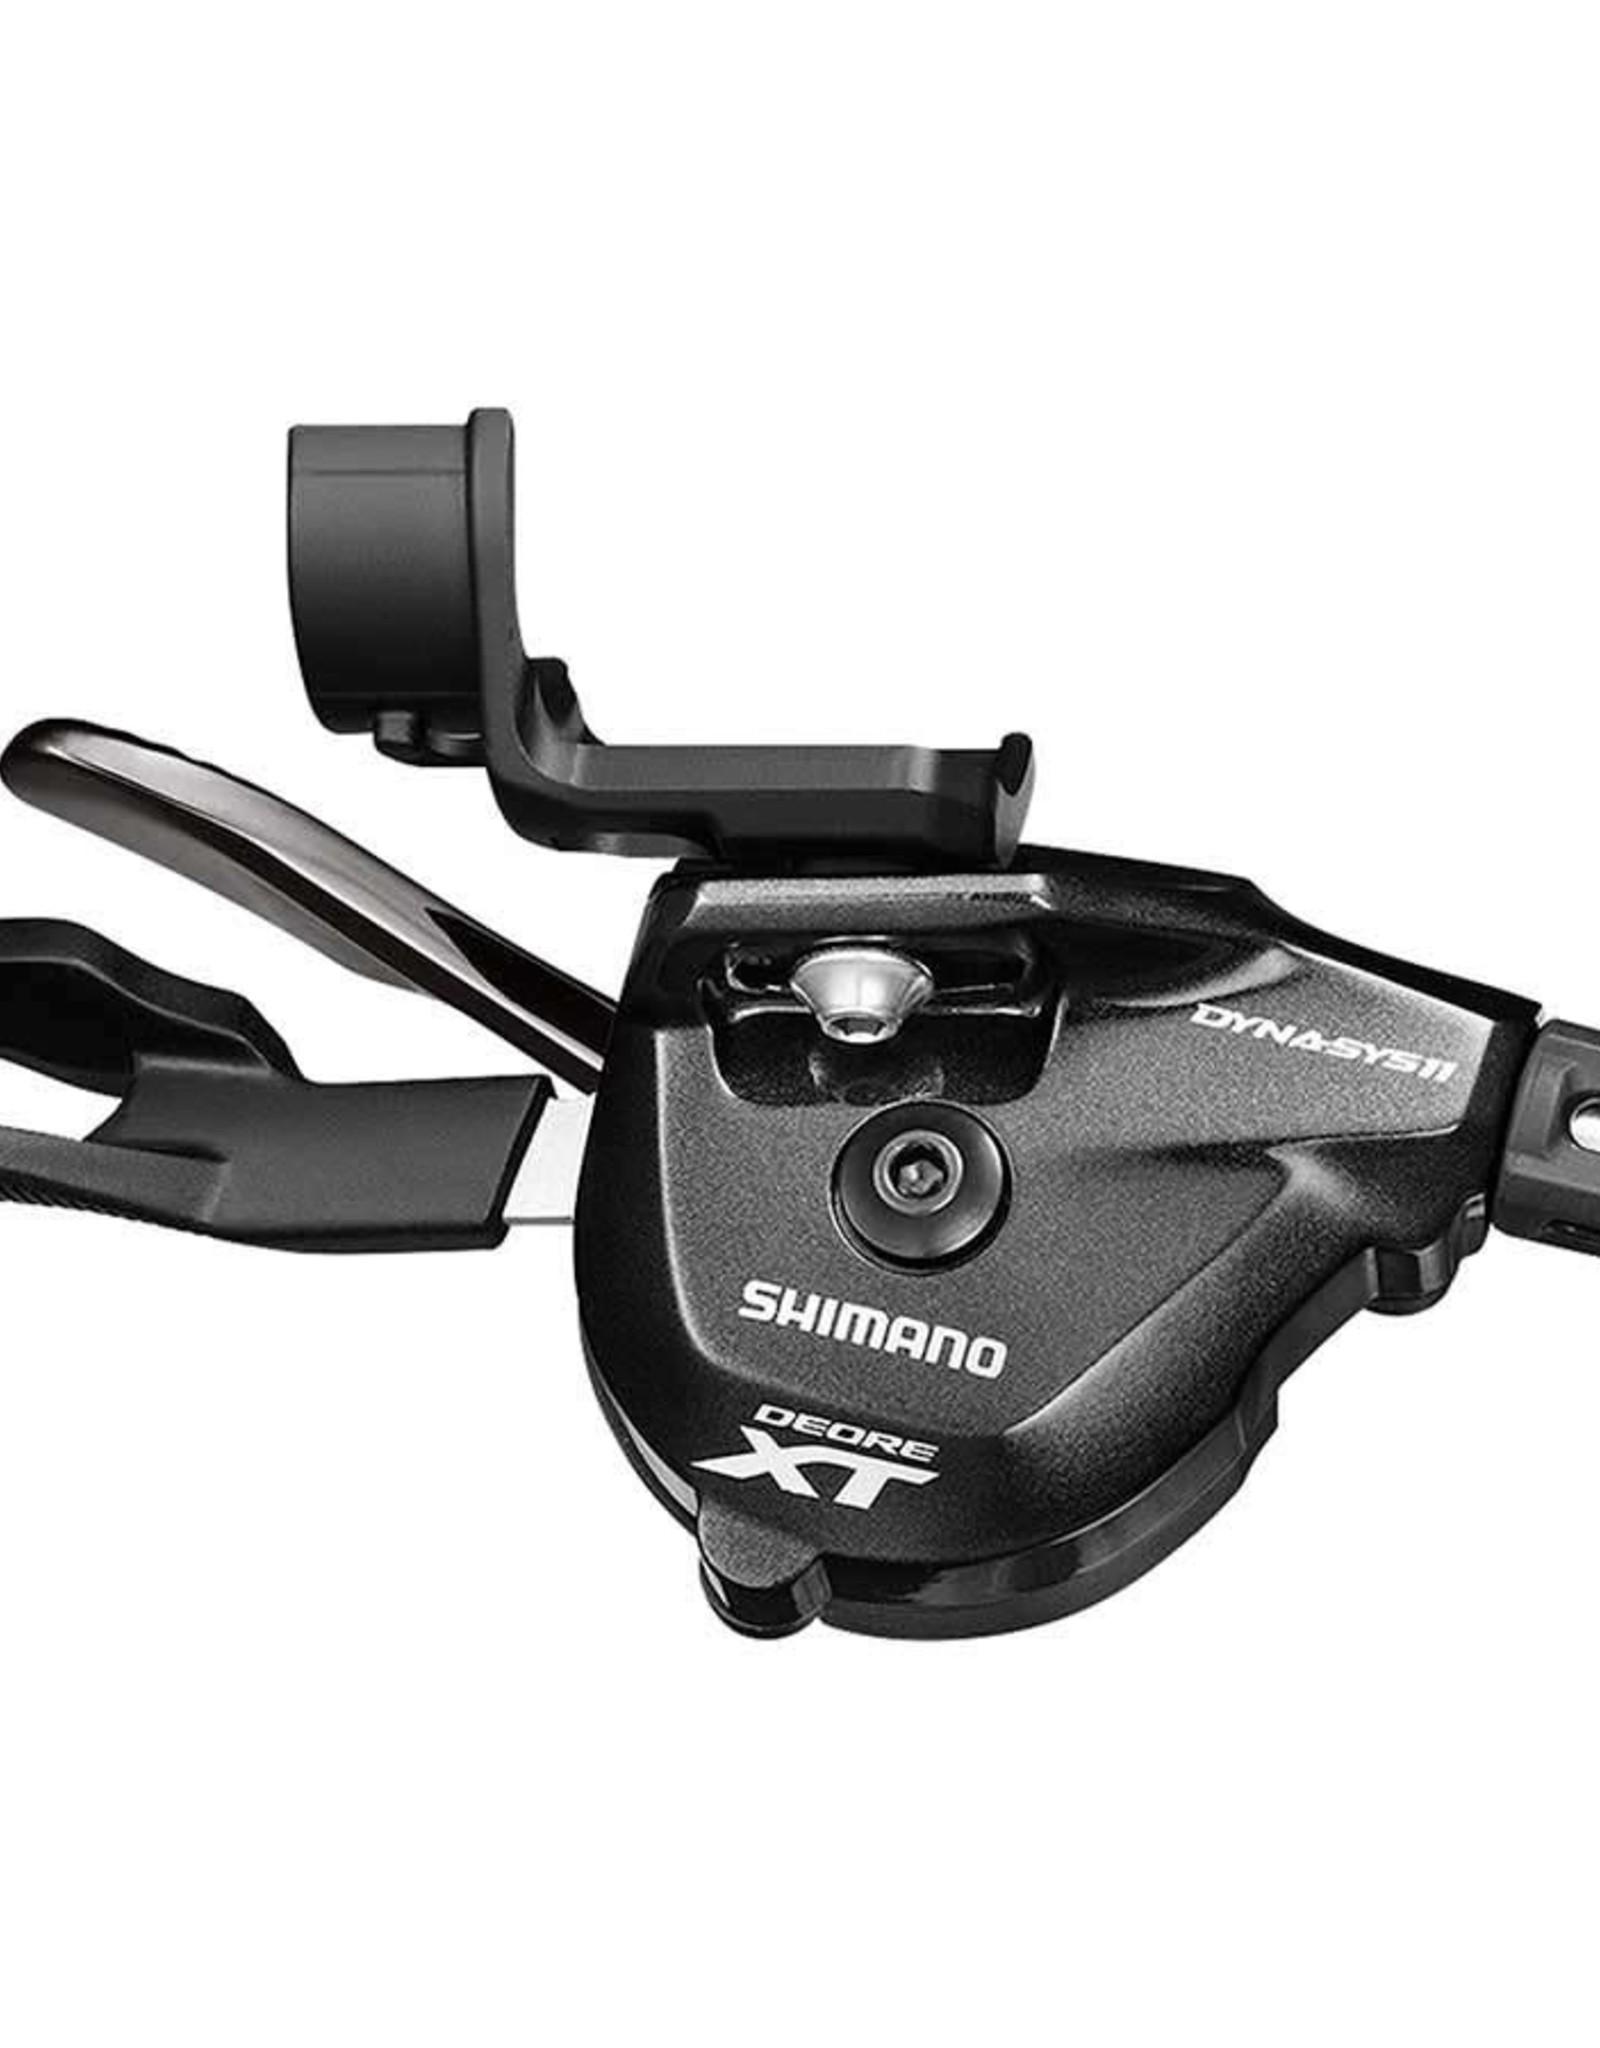 Shimano Shimano, XT-SL-M8000, Shift lever, 11 sp, Rear